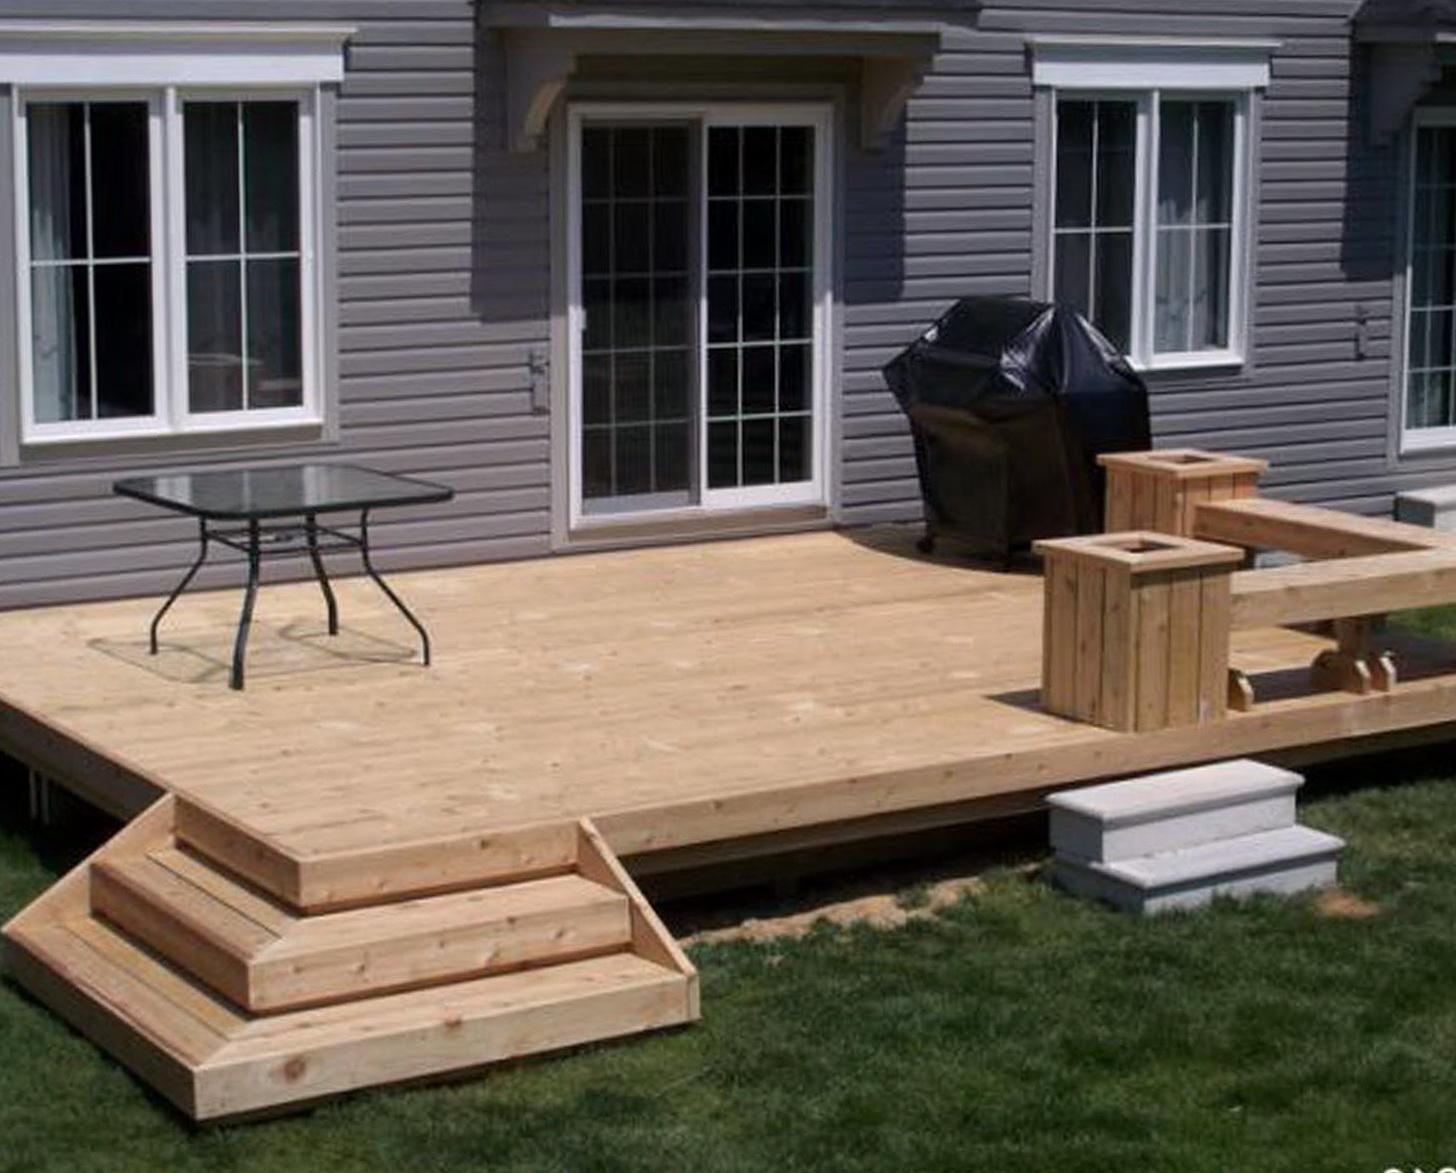 Simple deck design ideas home design ideas for Easy deck ideas